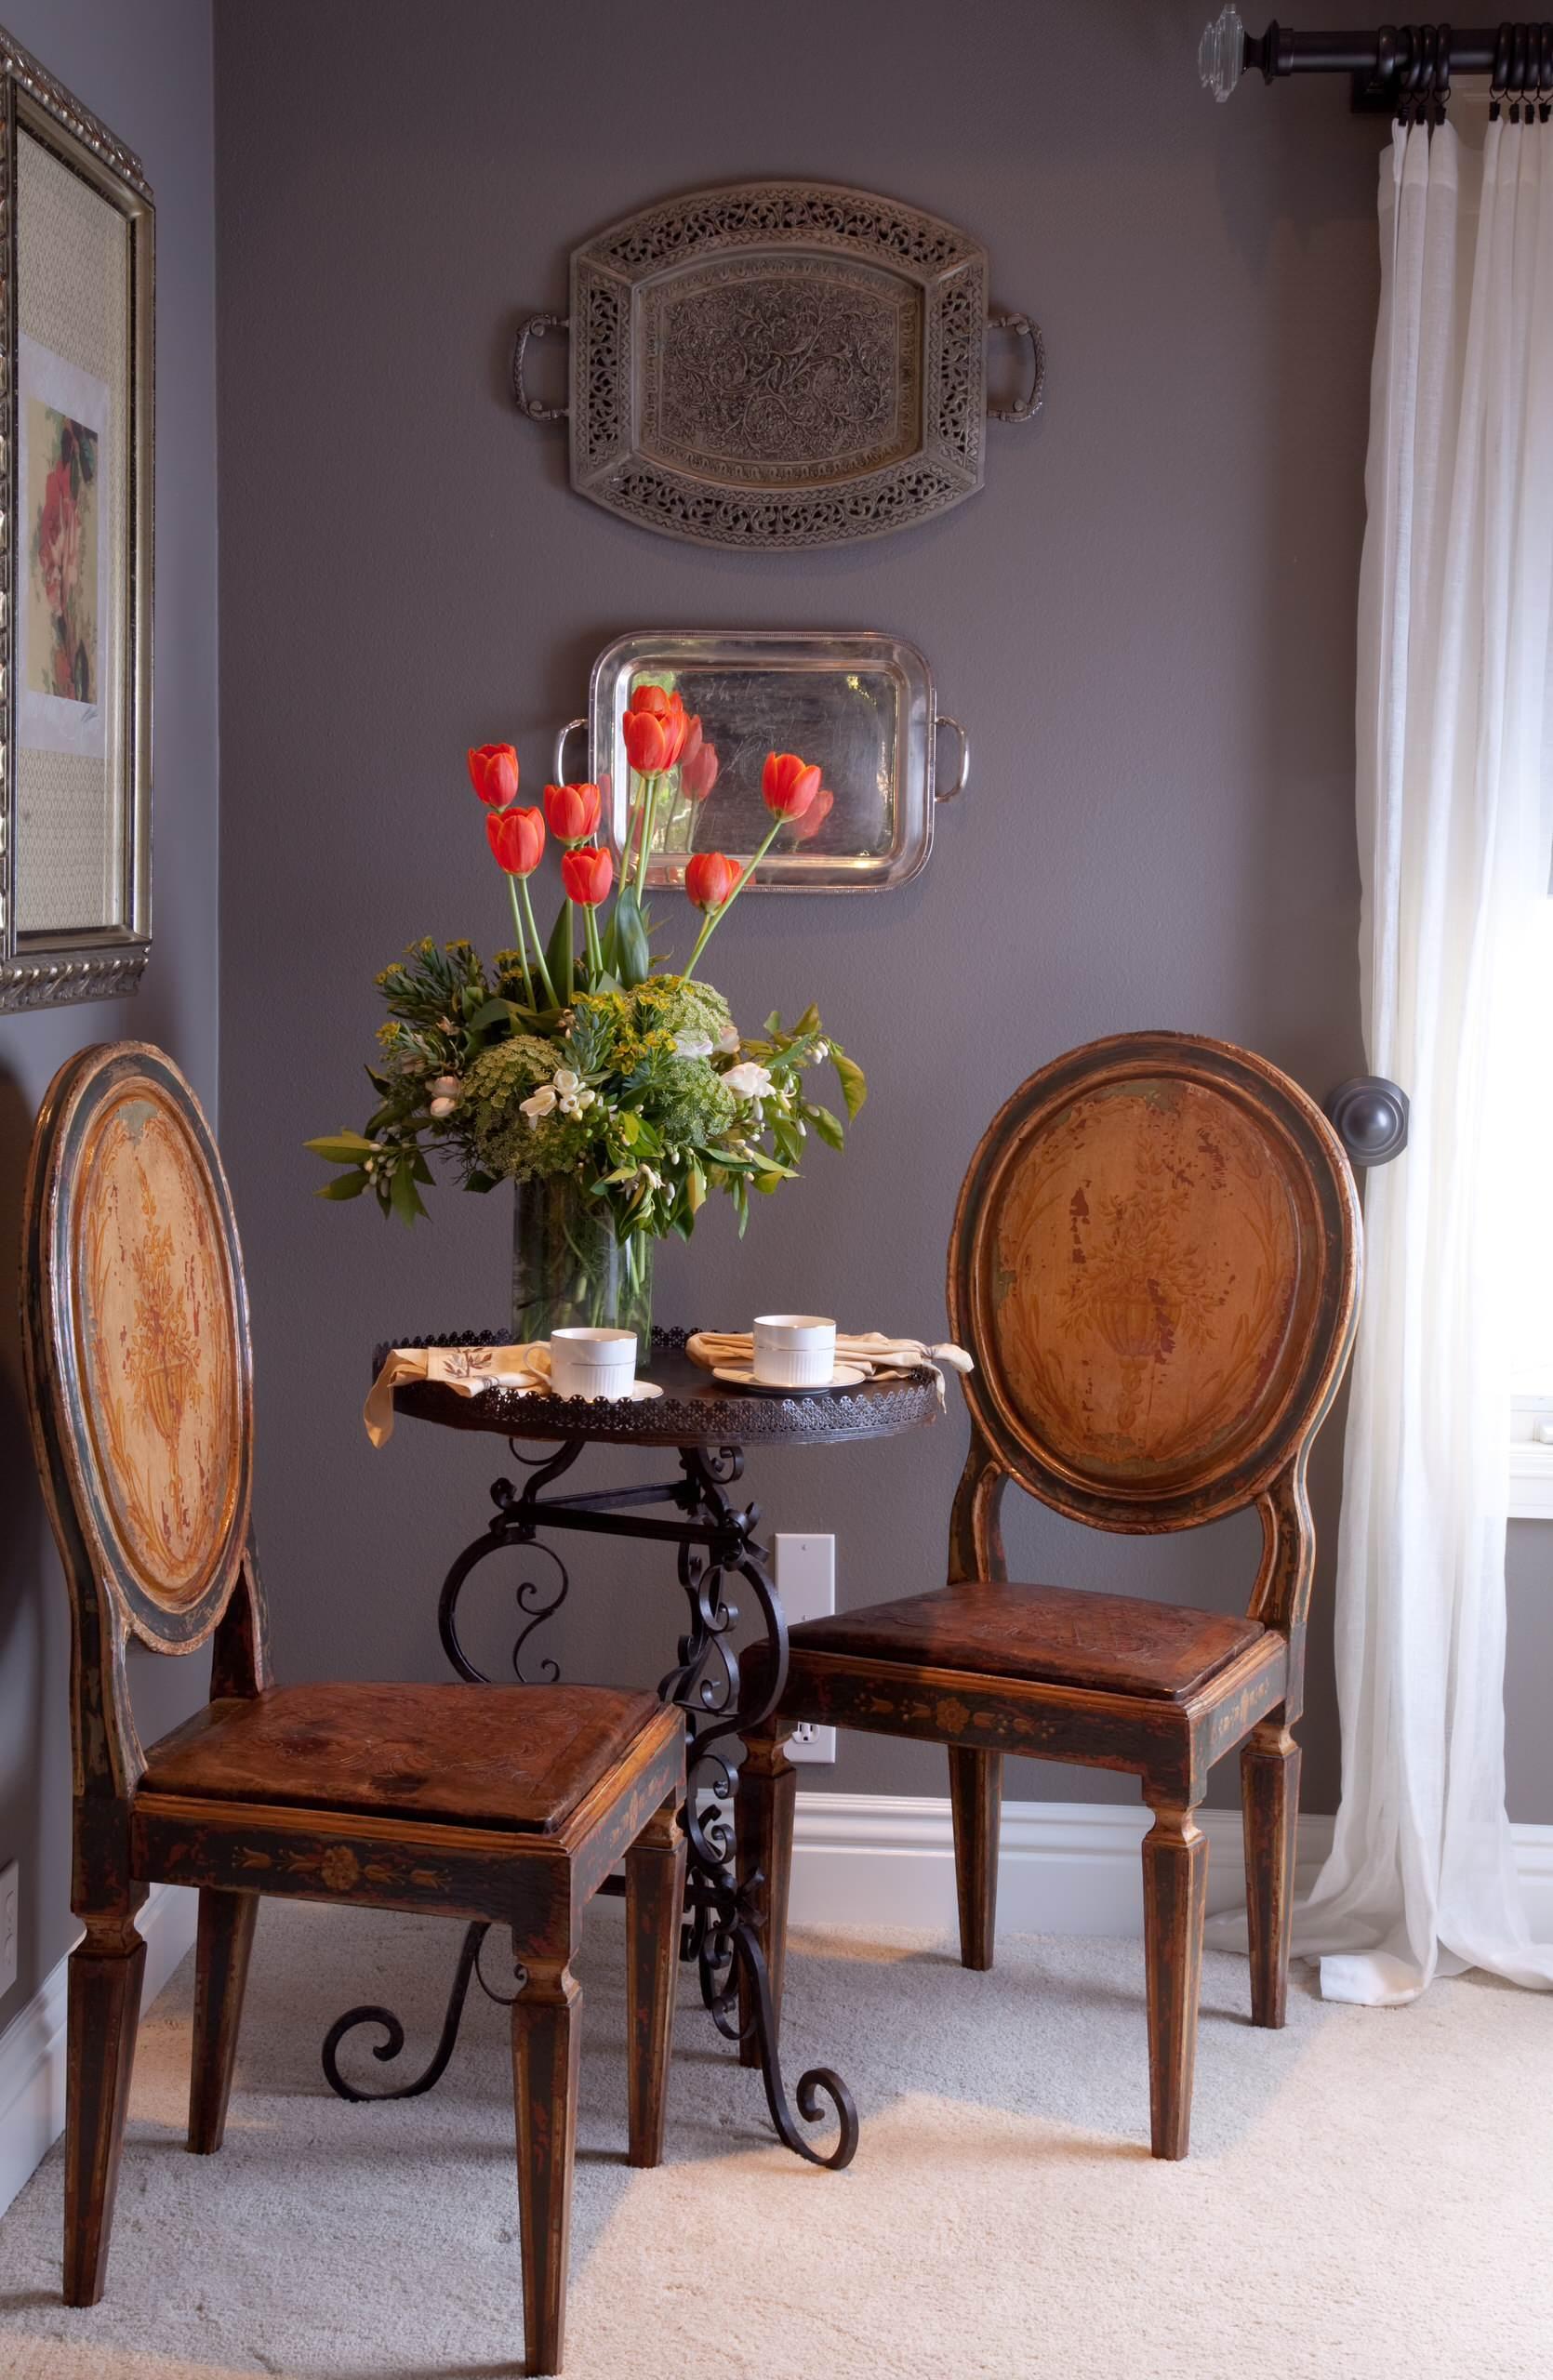 Romantic Guest Suite for Vicki Gunvalson of the RHOC